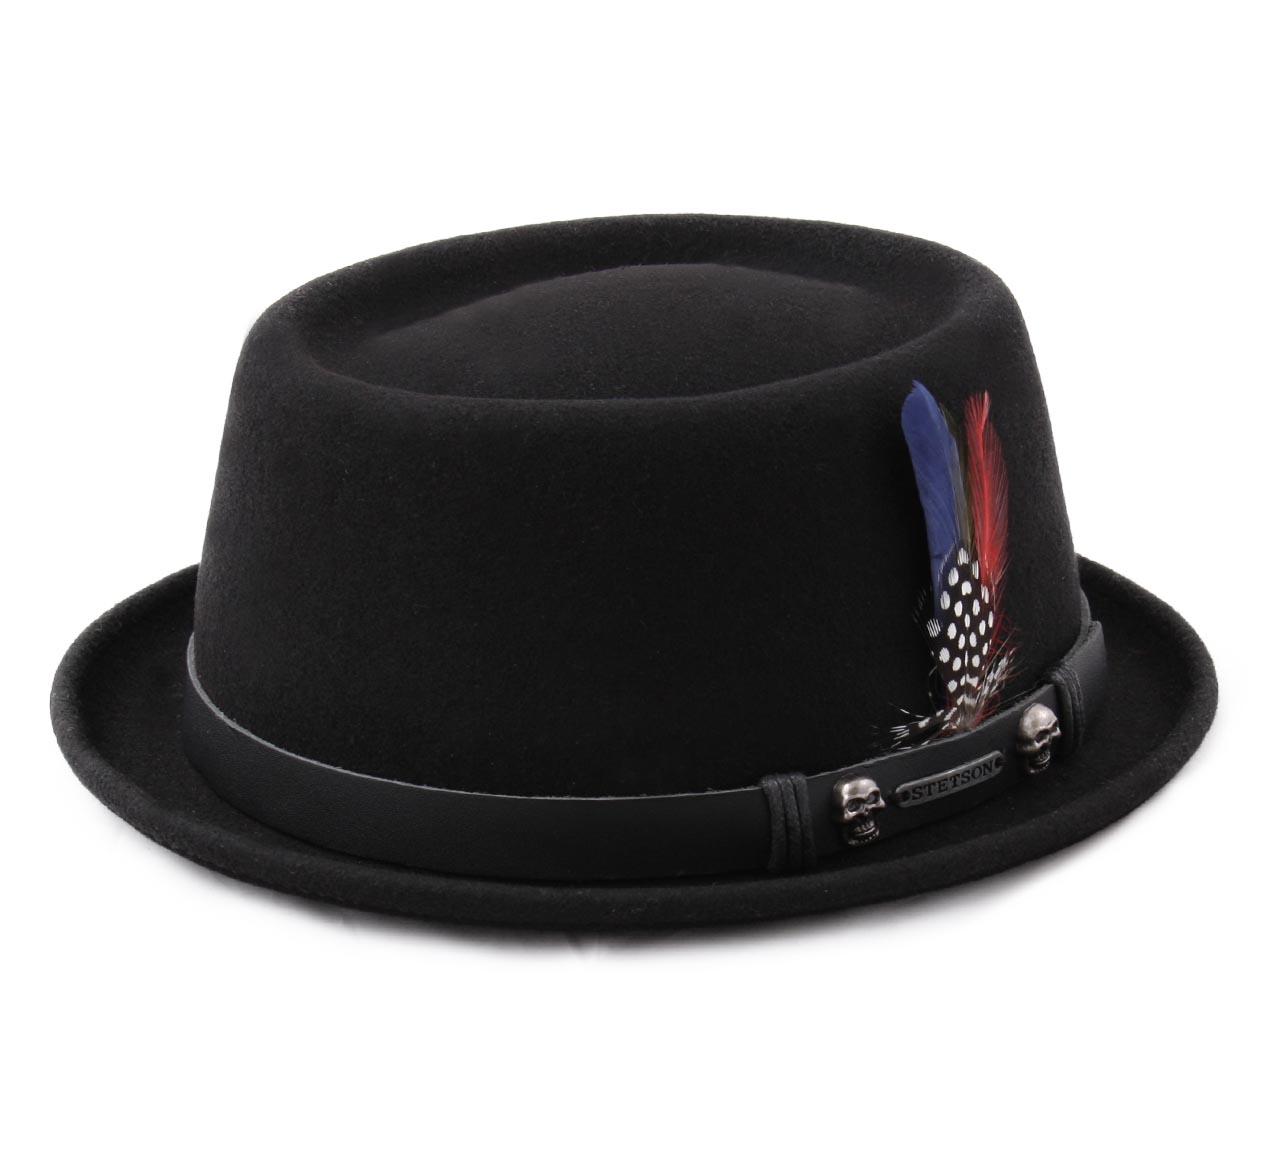 3992dcd9839 Pork Pie Woolfelt - Hats Stetson